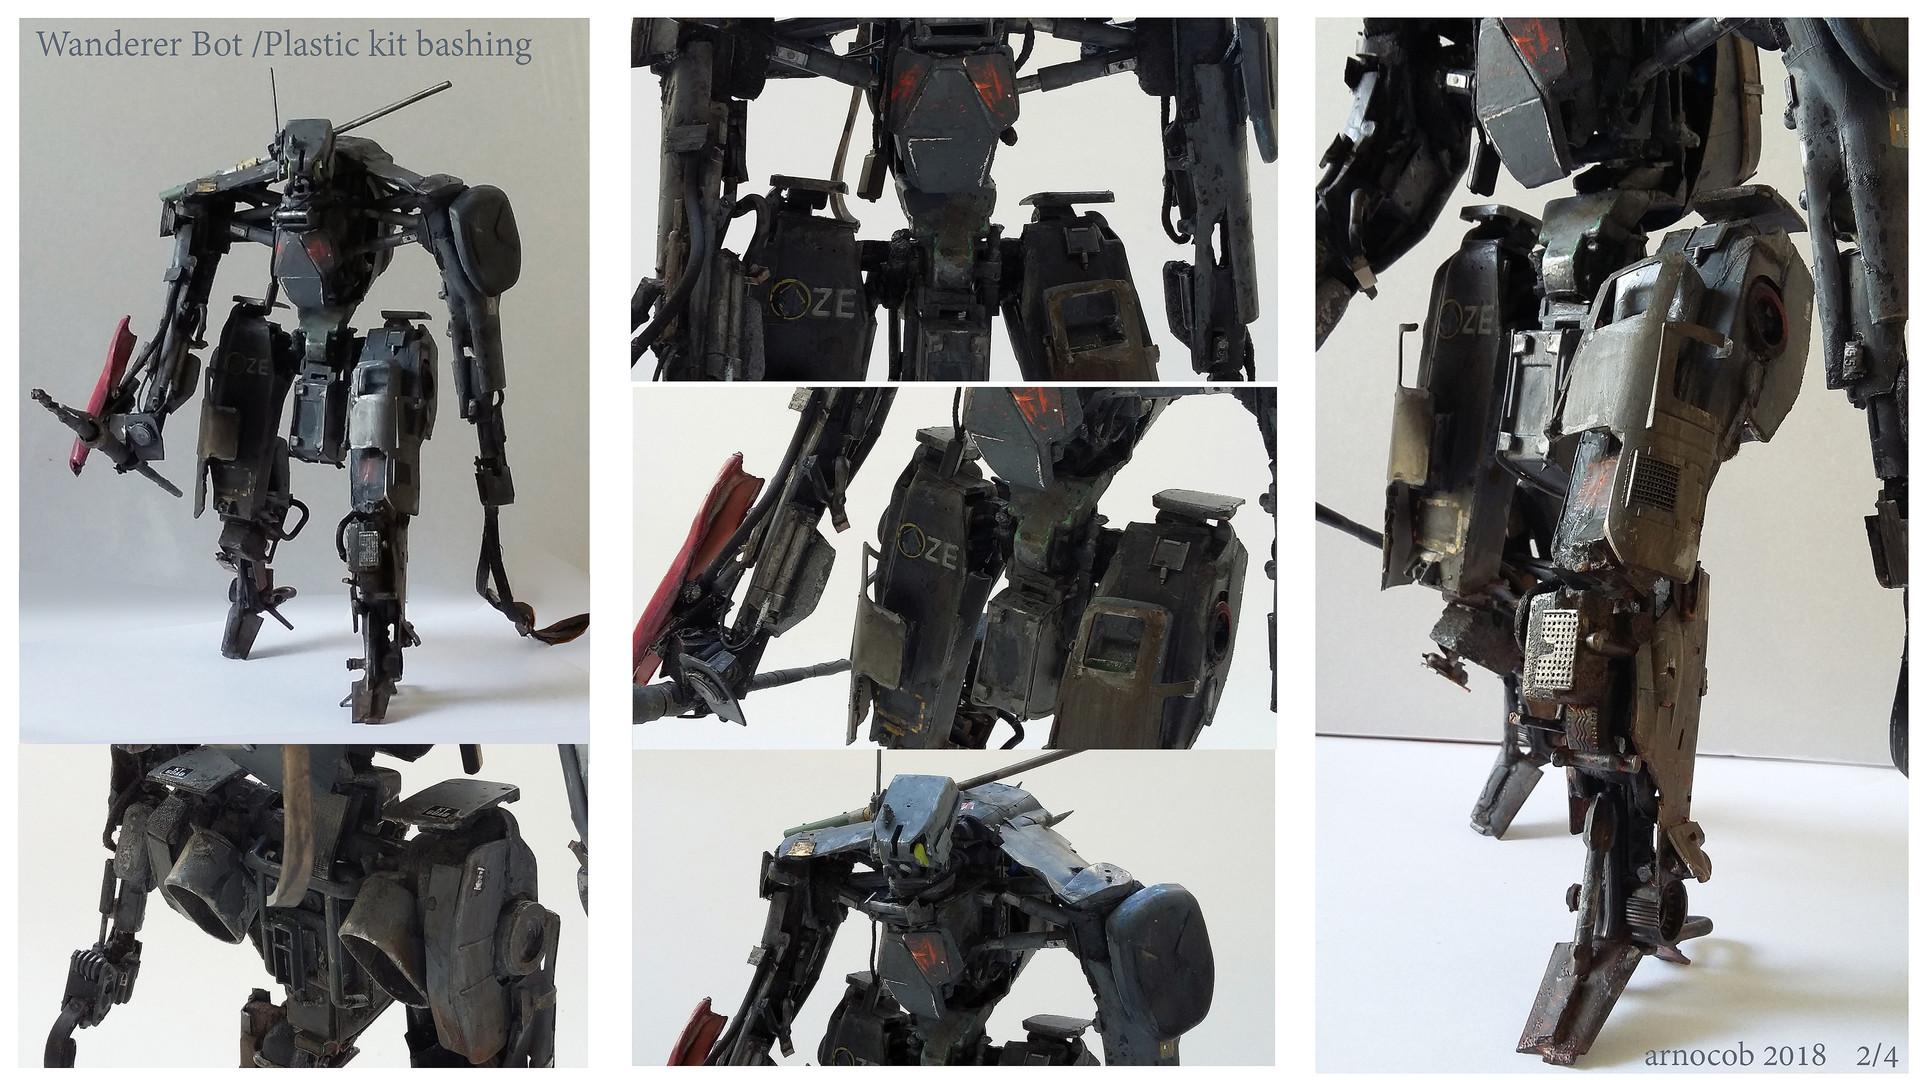 Arnaud caubel wandererbot plastickitbashing arnocob 02